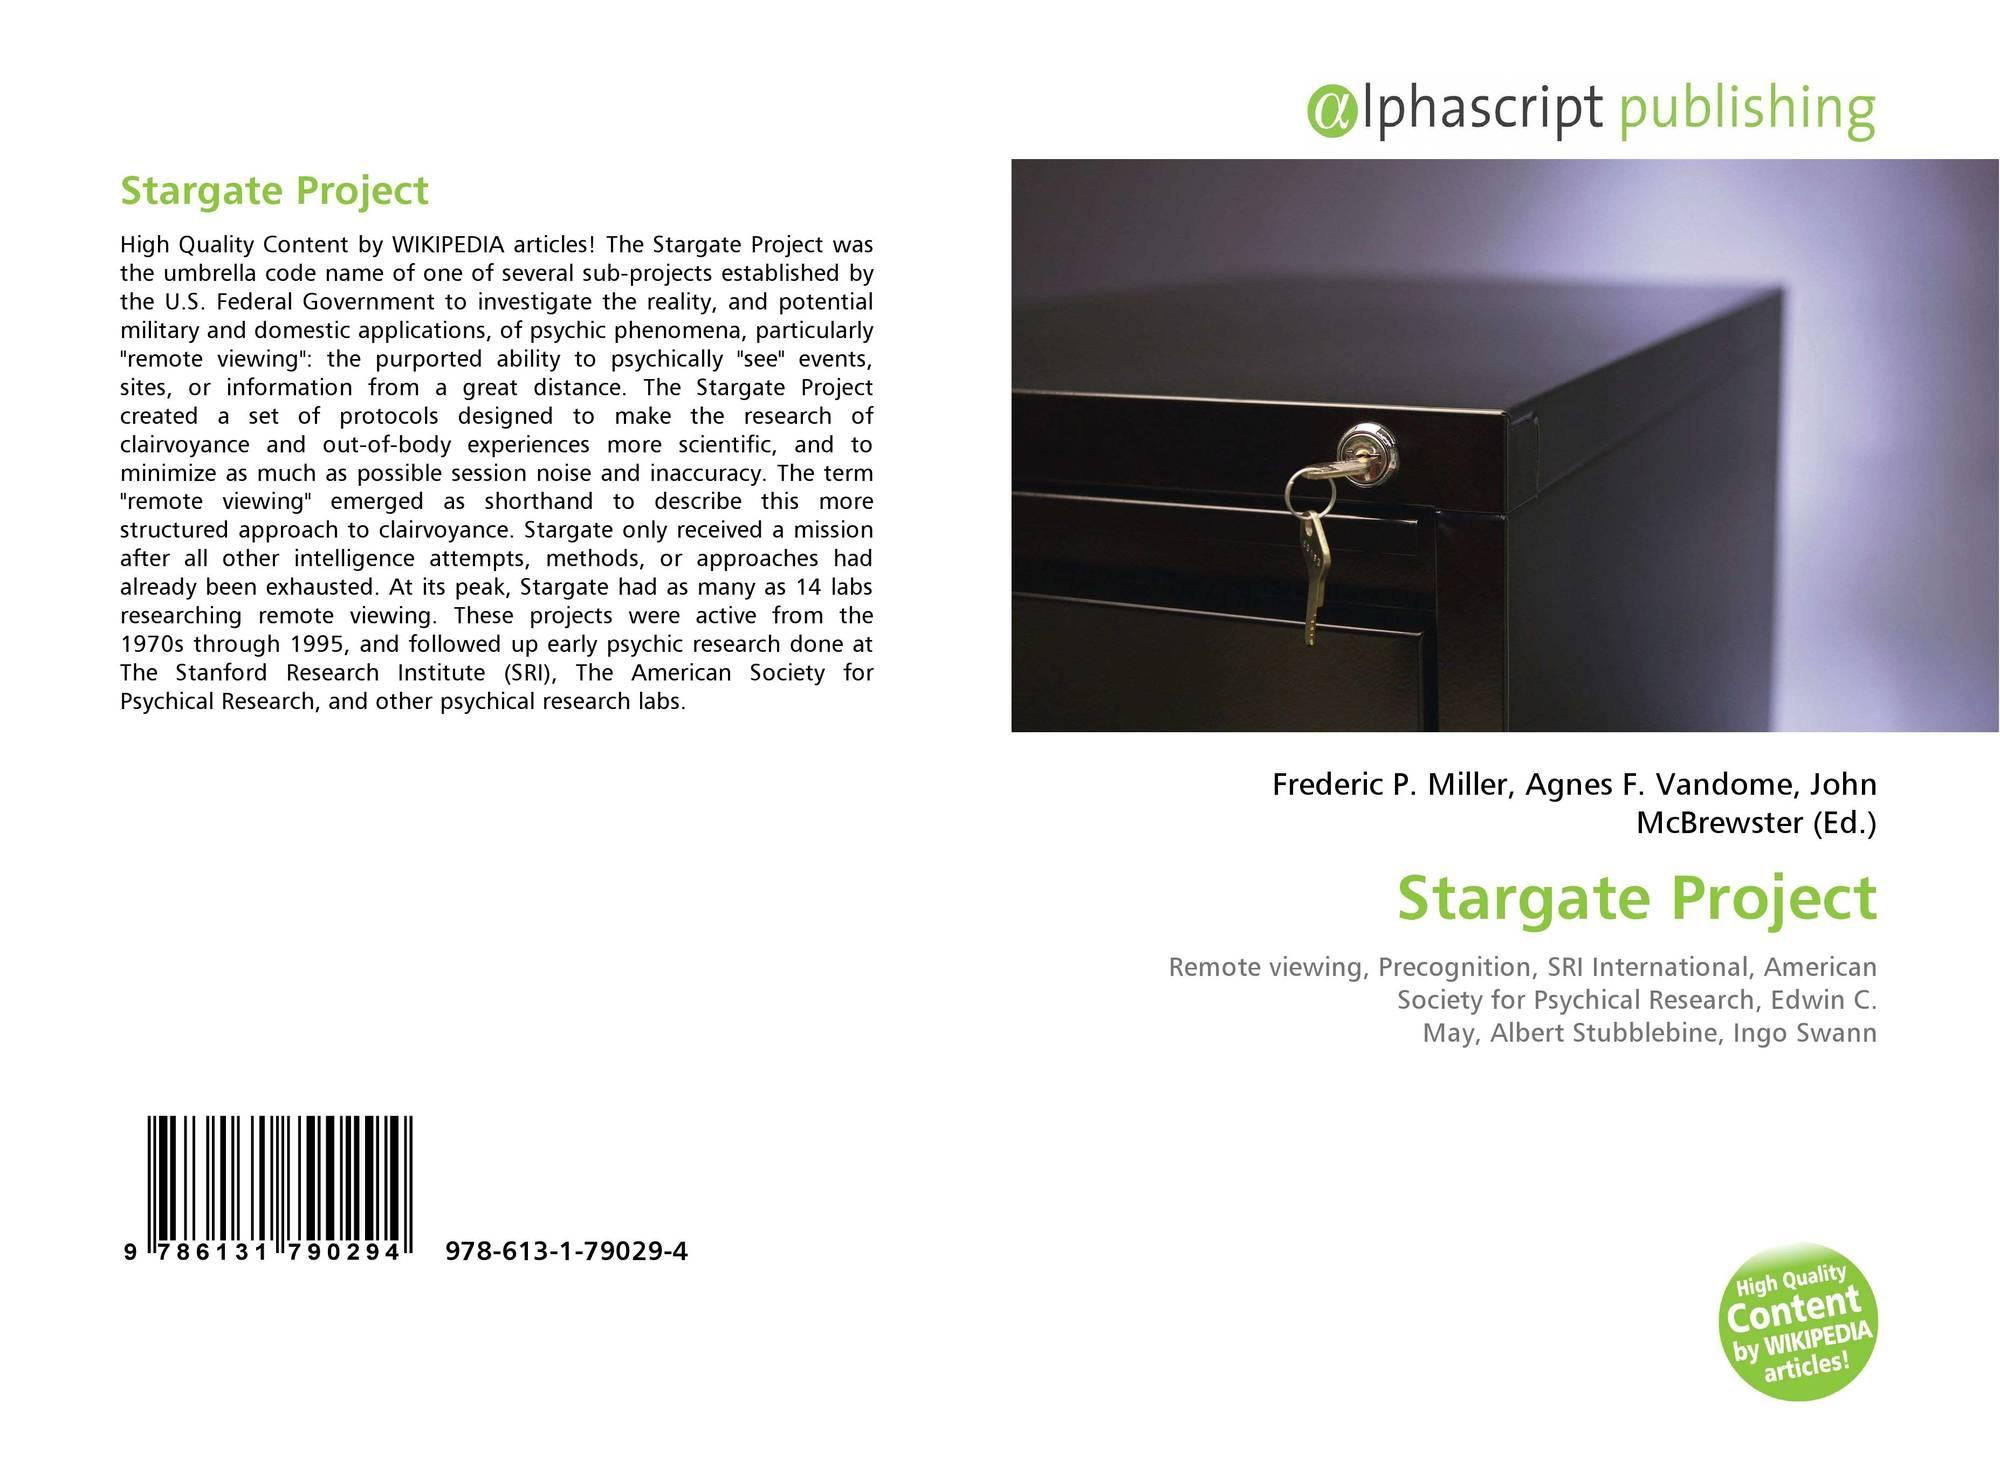 Stargate Project, 978-613-1-79029-4, 6131790299 ,9786131790294